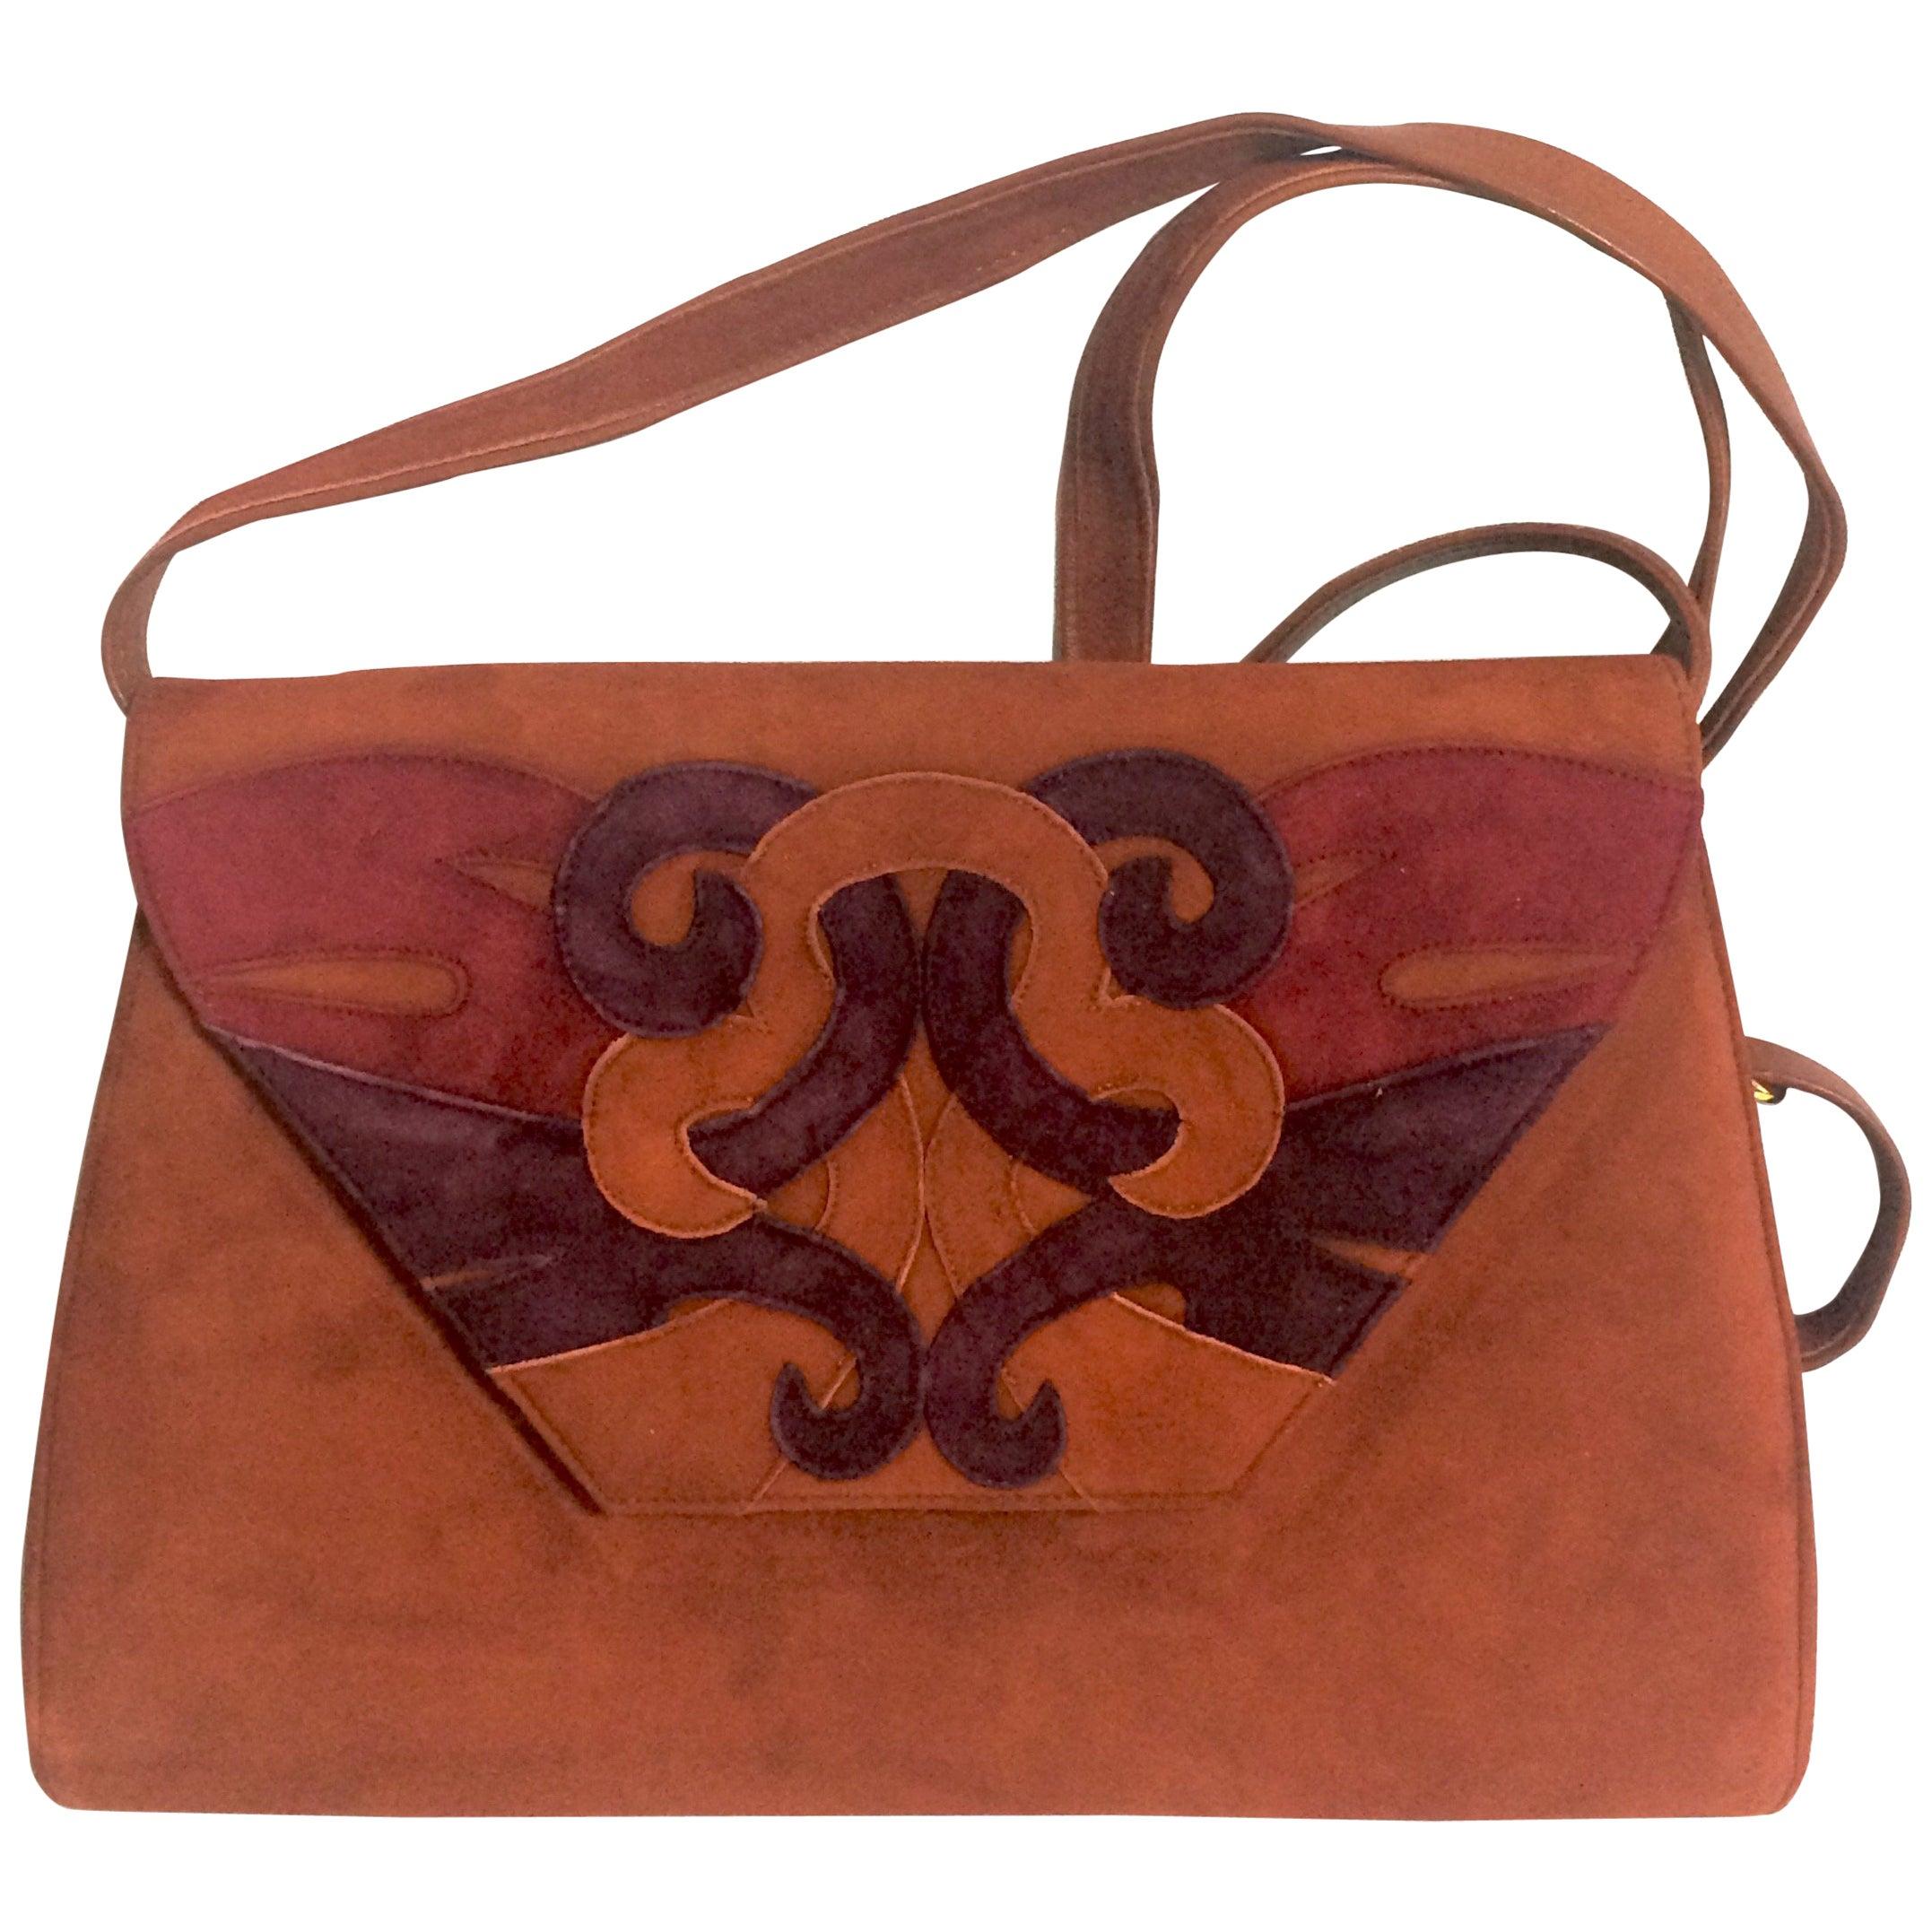 Charles Jourdan Copper Snakeskin Clutch Or Shoulder Bag Z3X9xd4sK